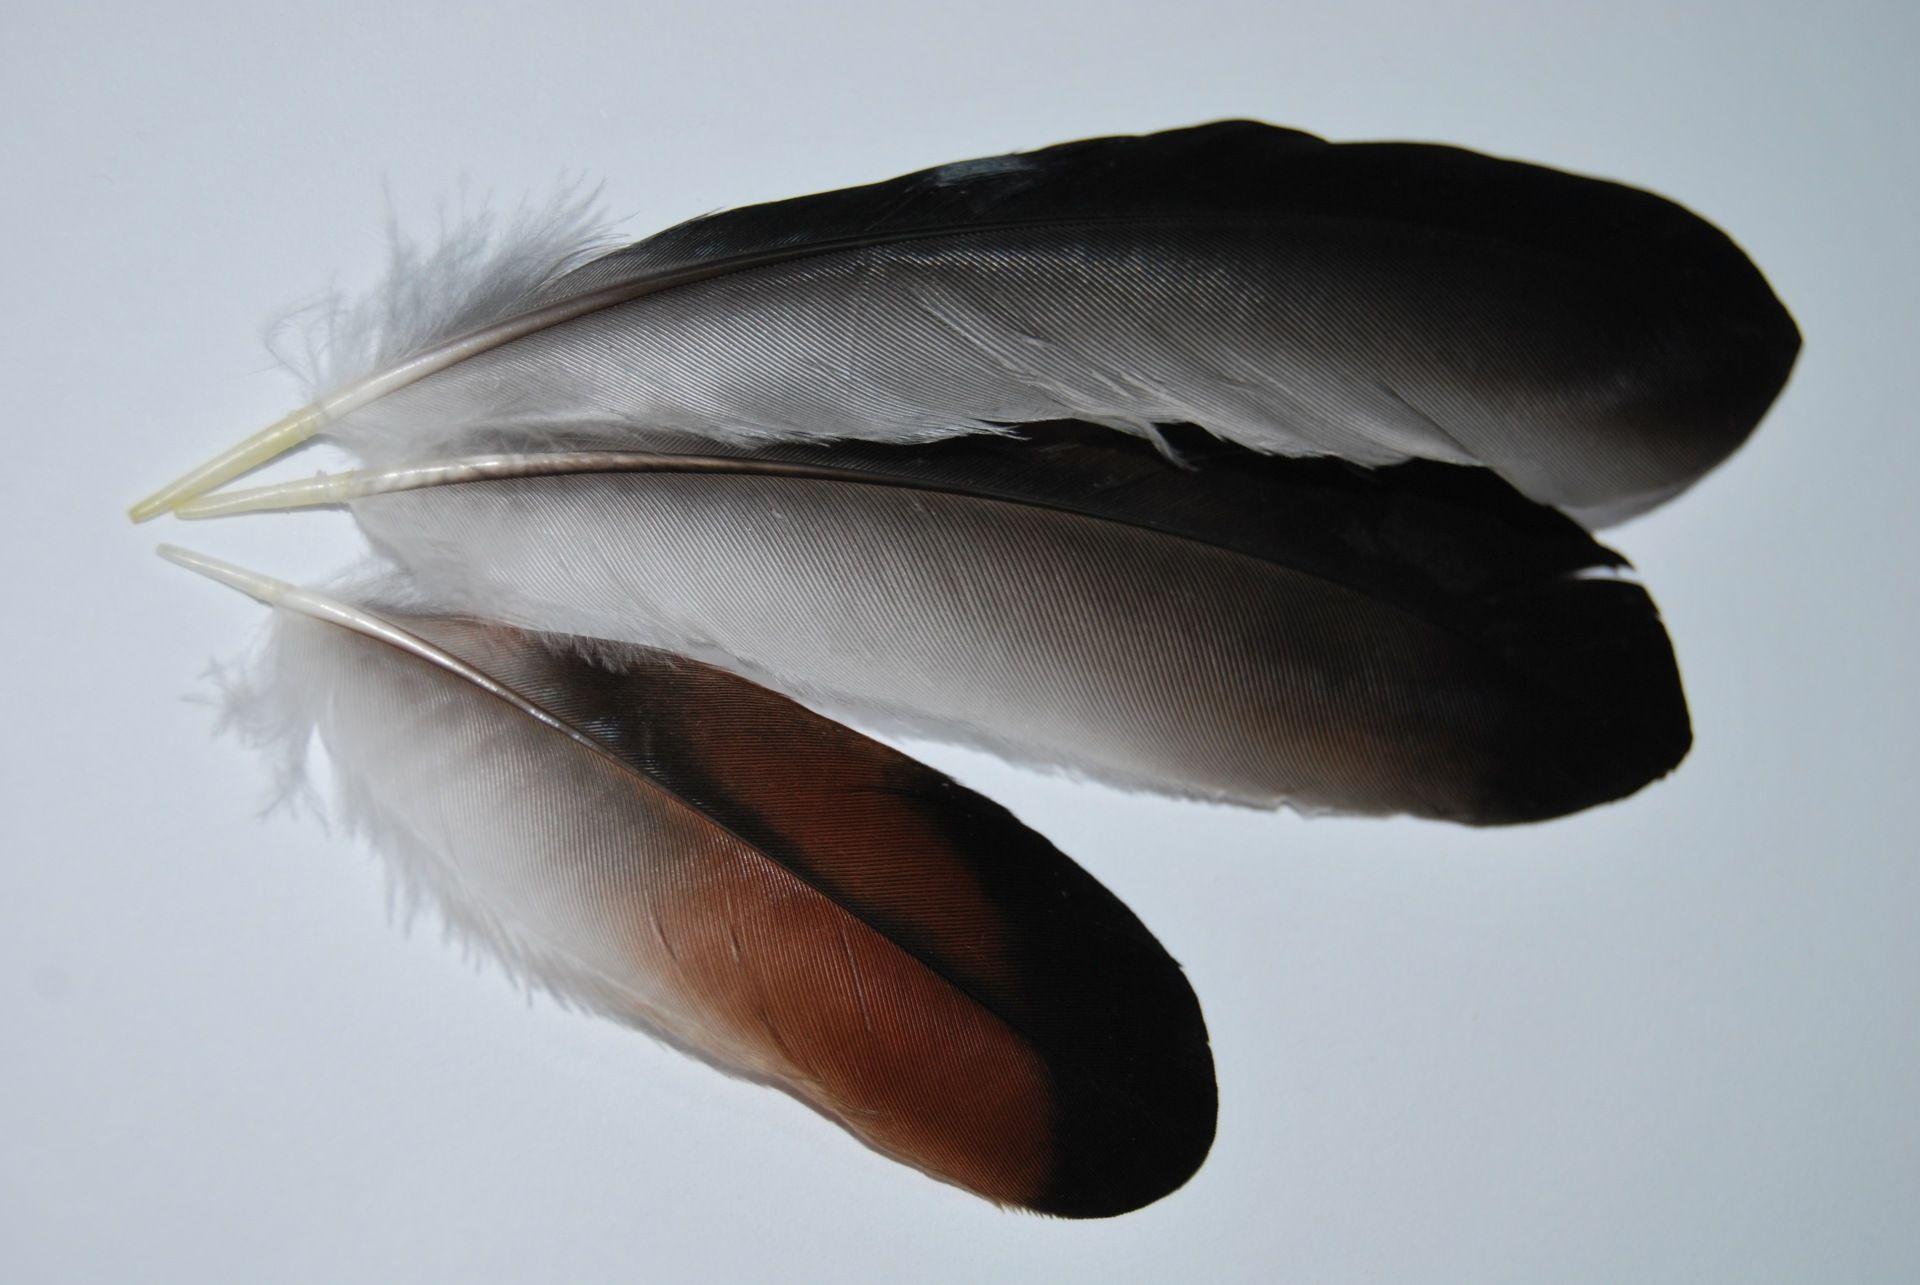 plumes-de-geai-des-chenes